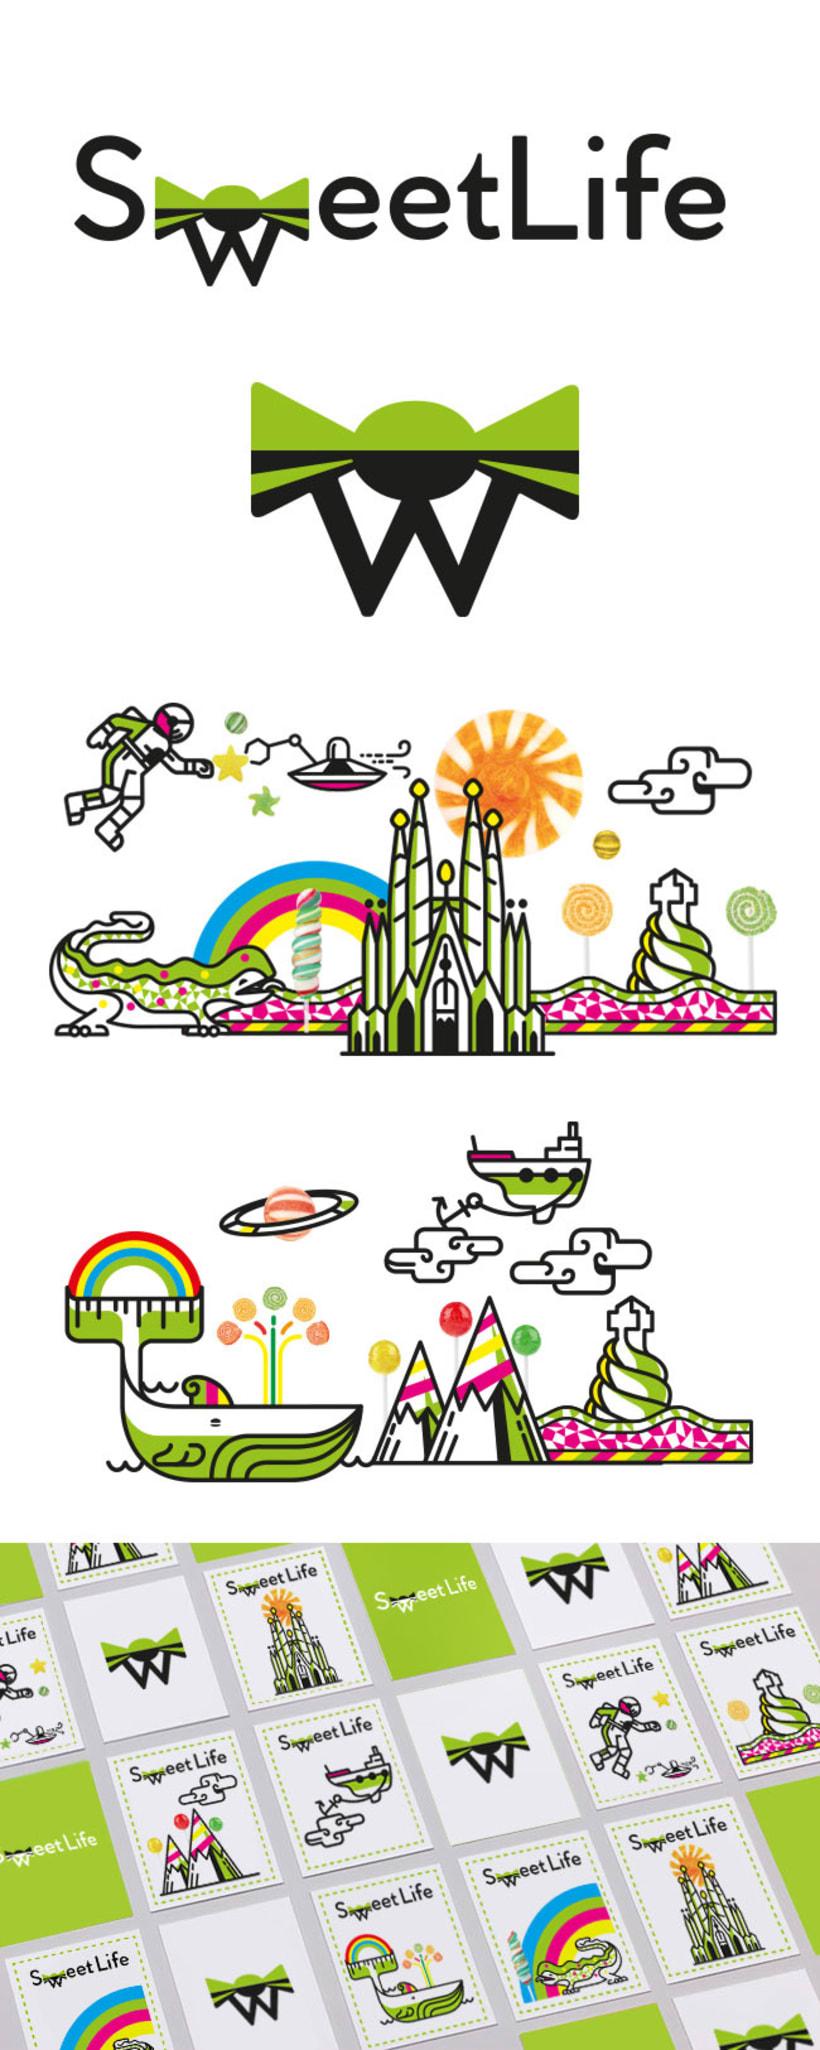 Logotipo e imagen Sweet Life 2